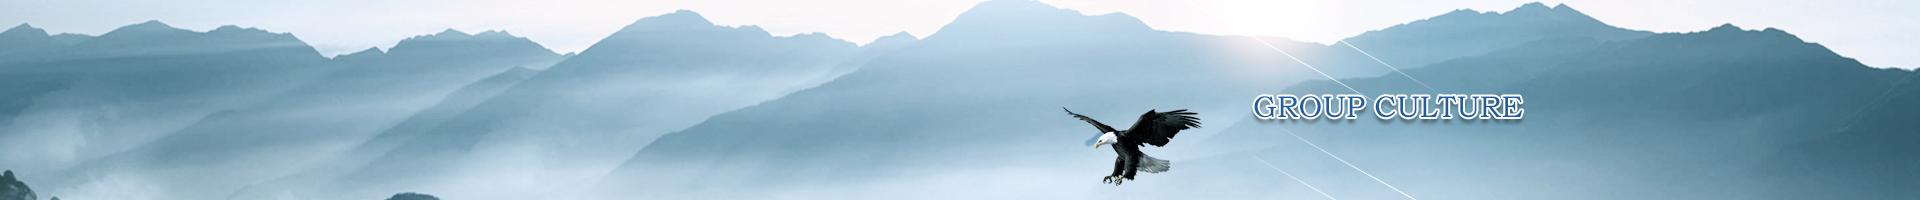 4118云顶集团app